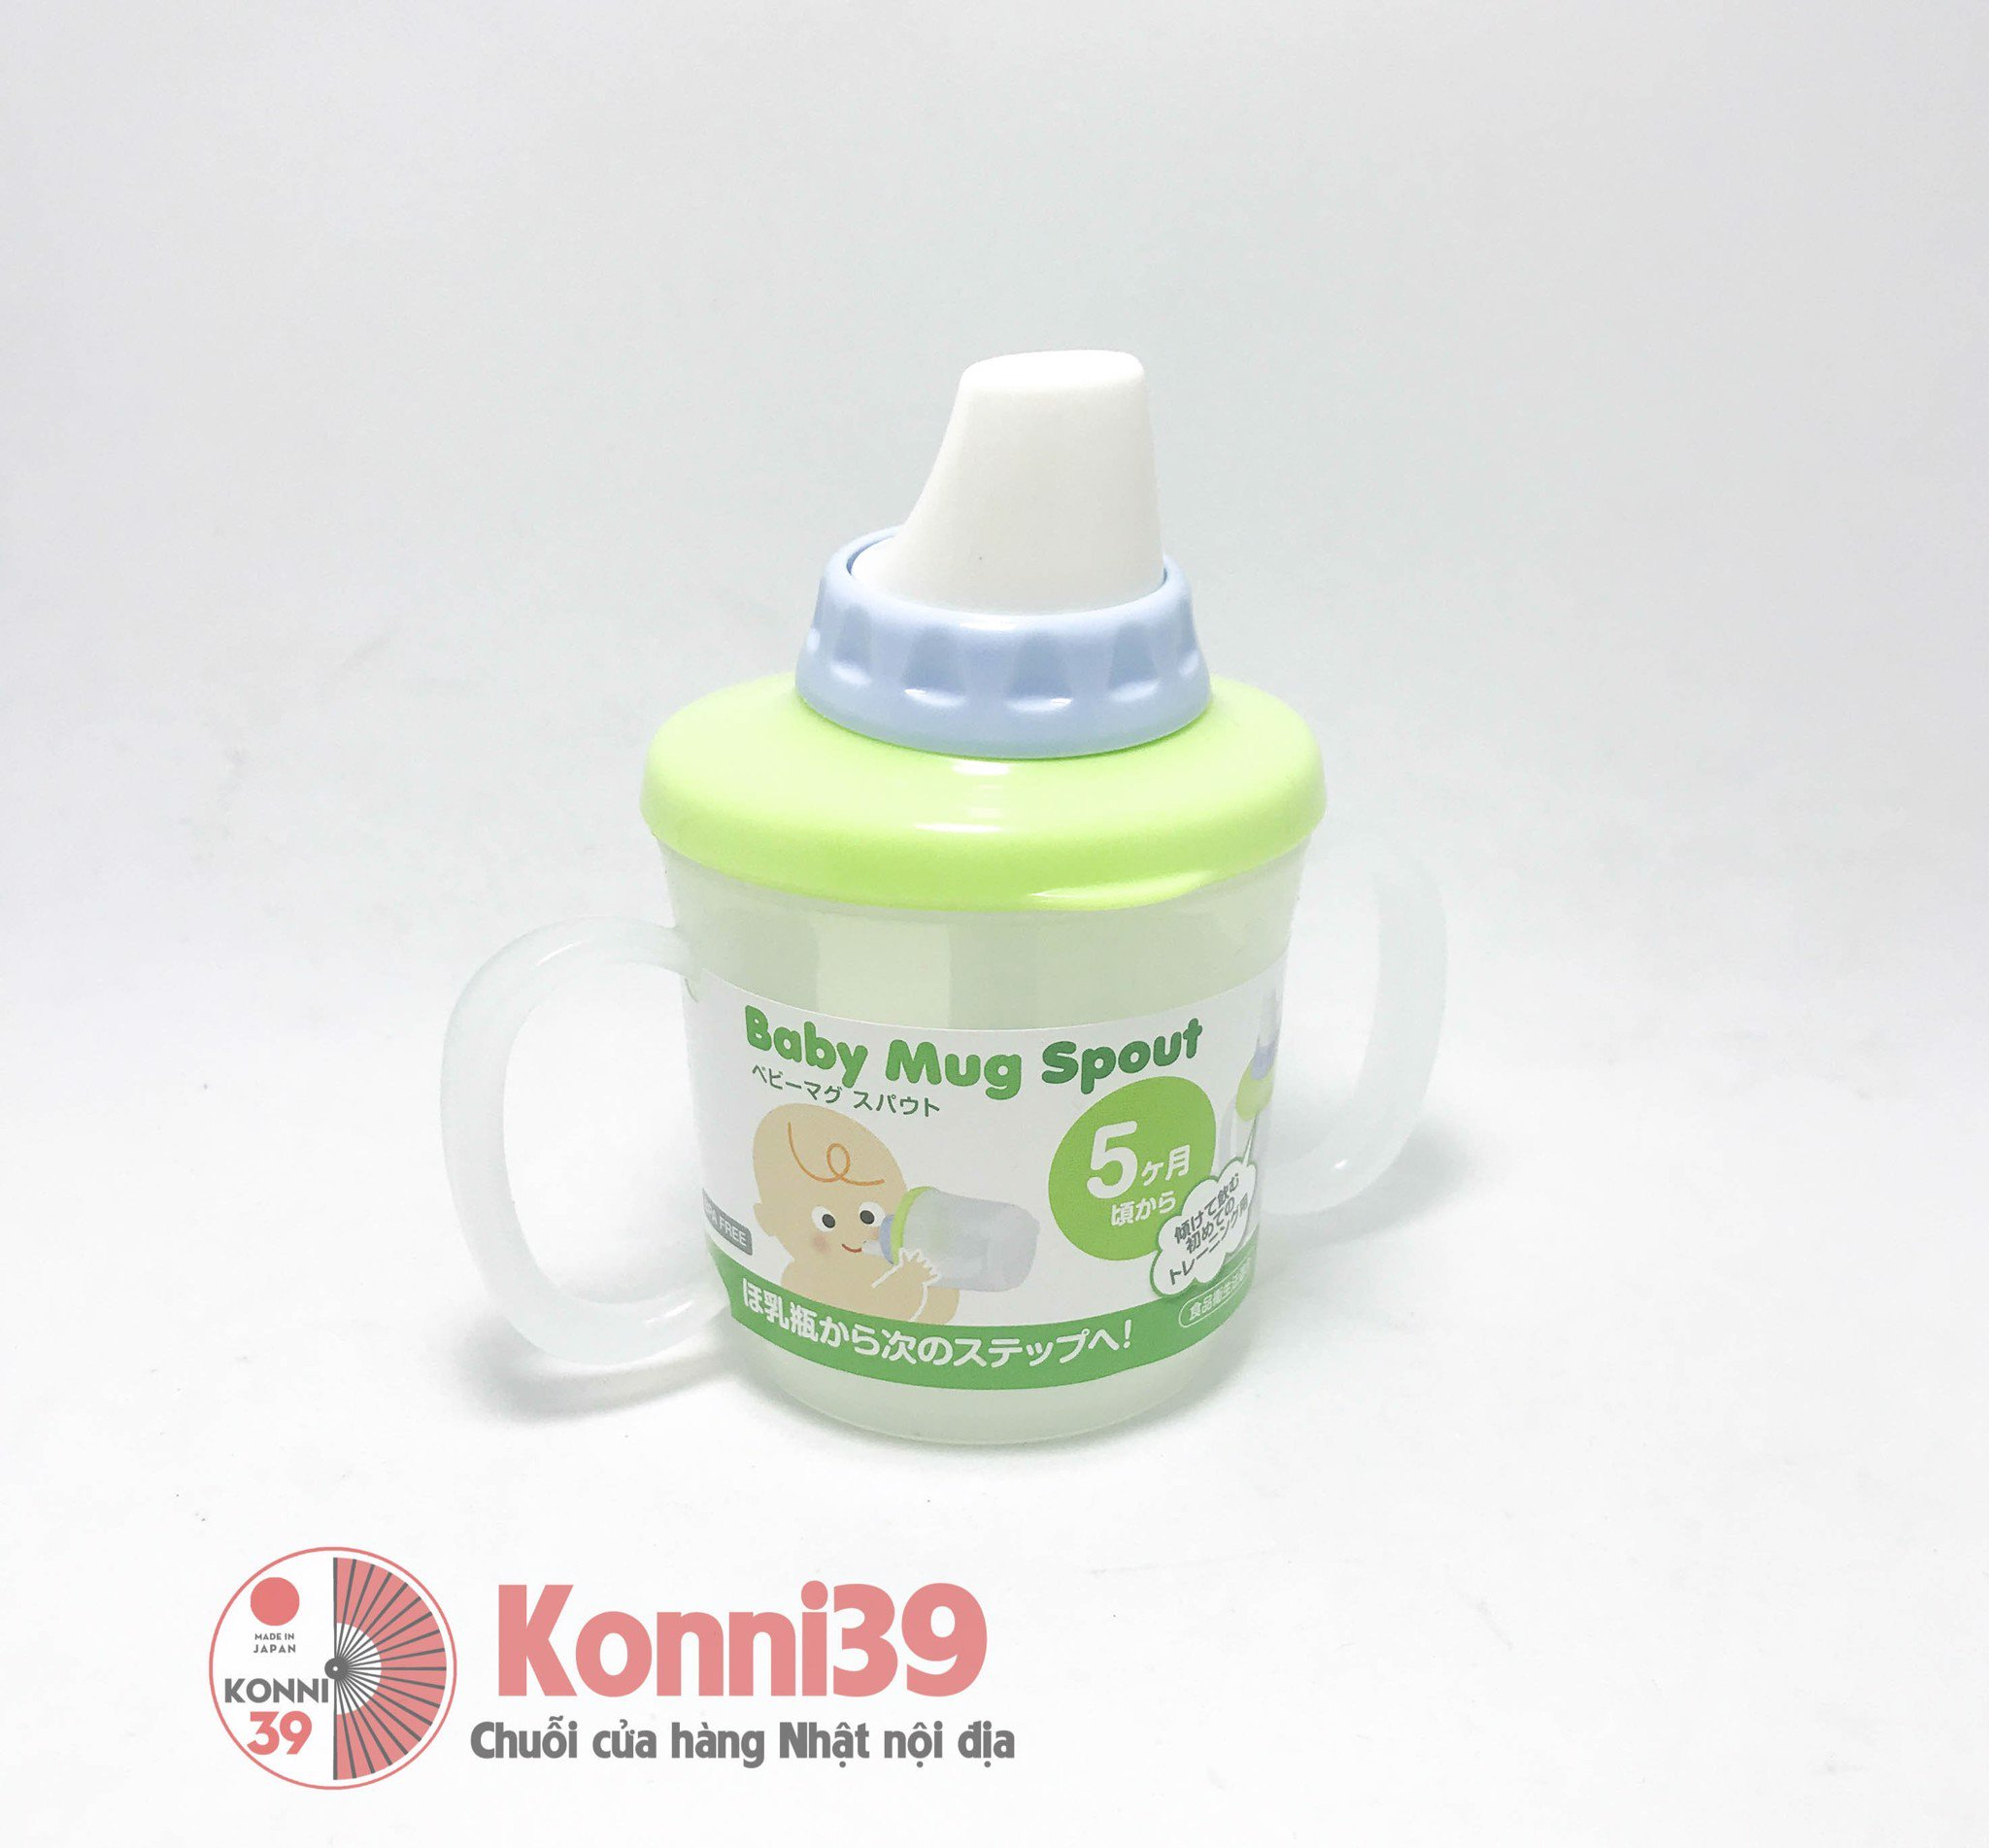 coc-tap-uong-mieng-voi-inomata-230ml-xanh